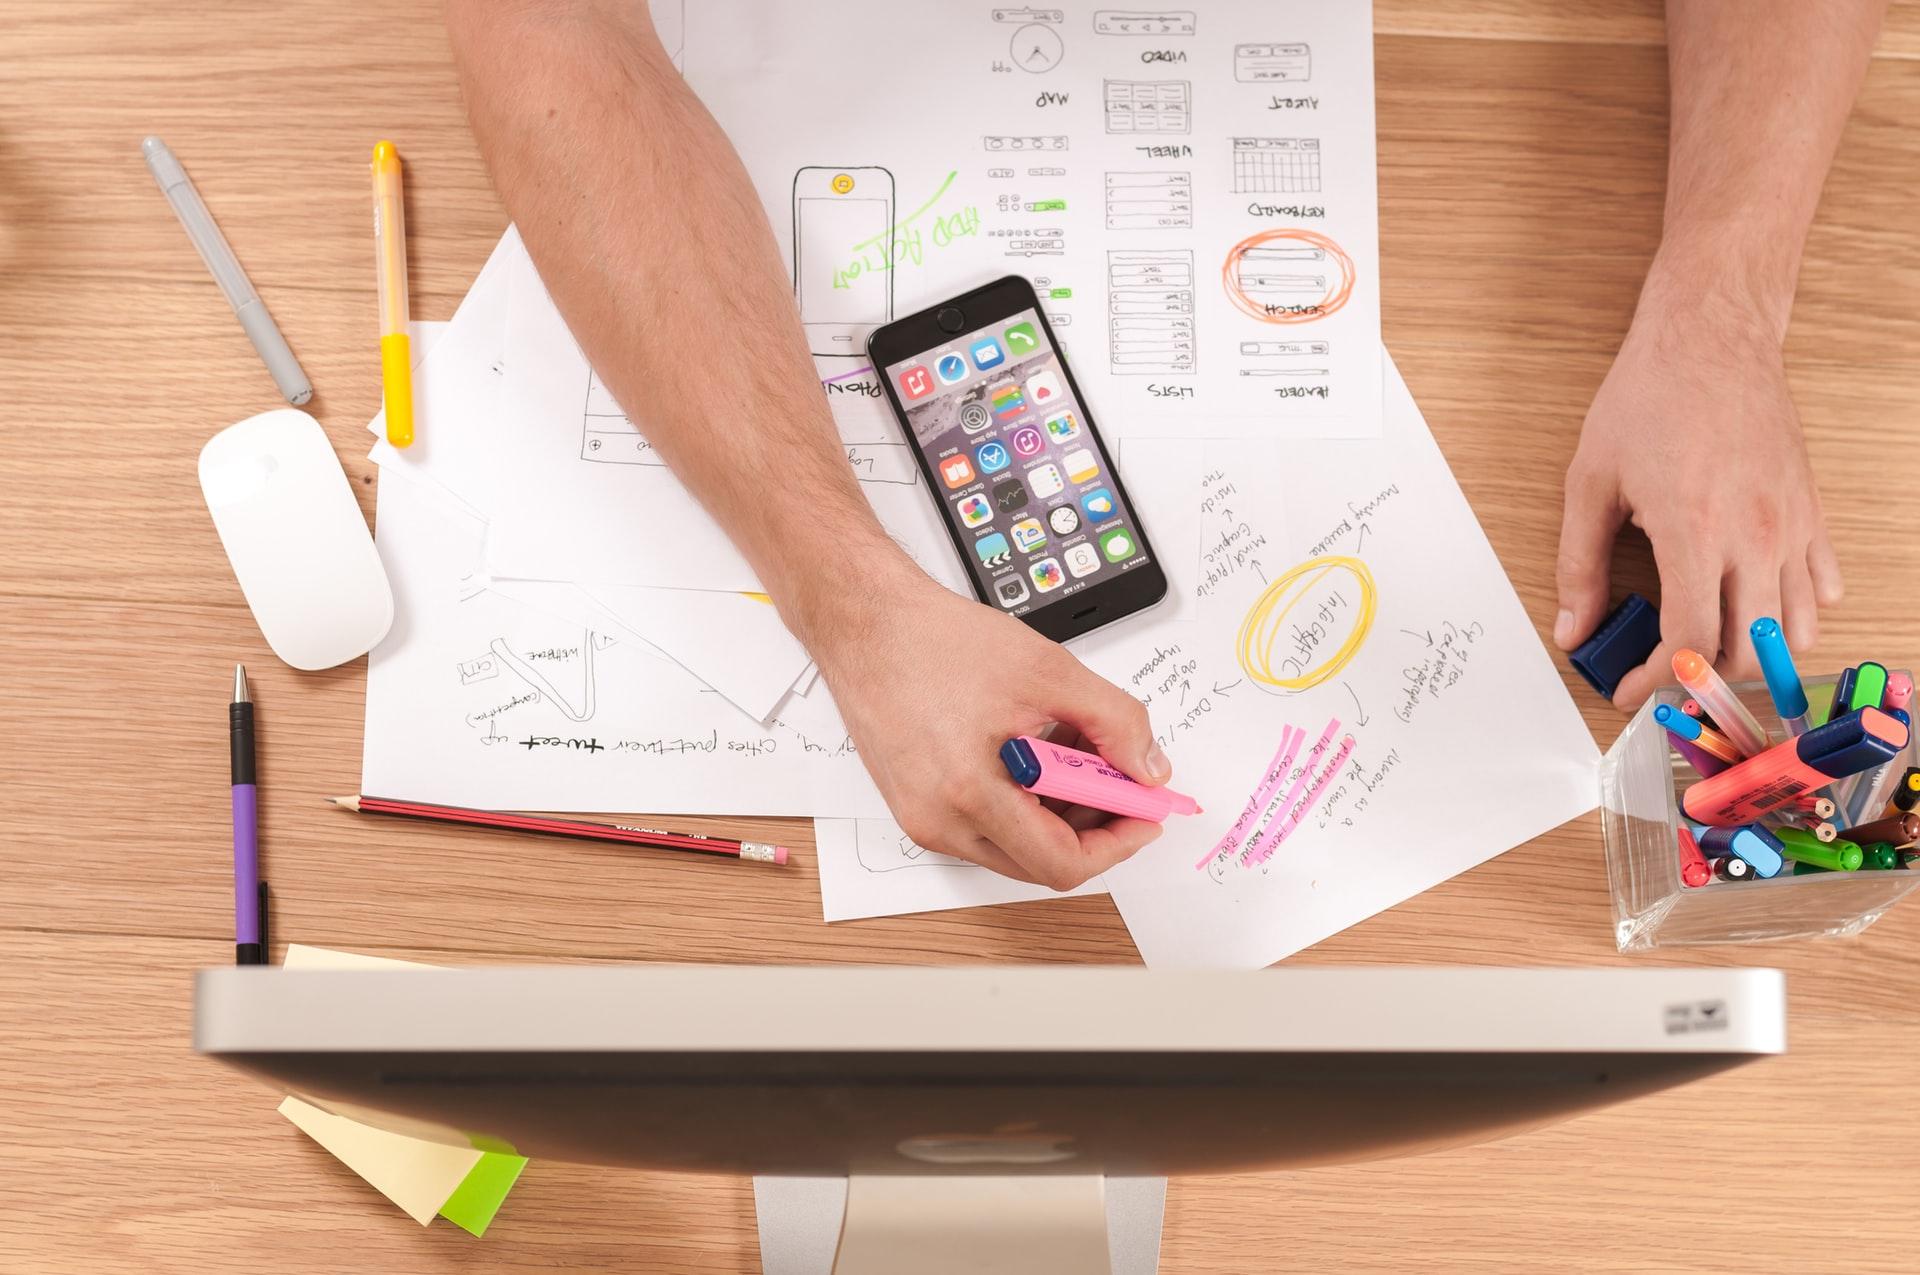 How to Give Helpful Design Feedback